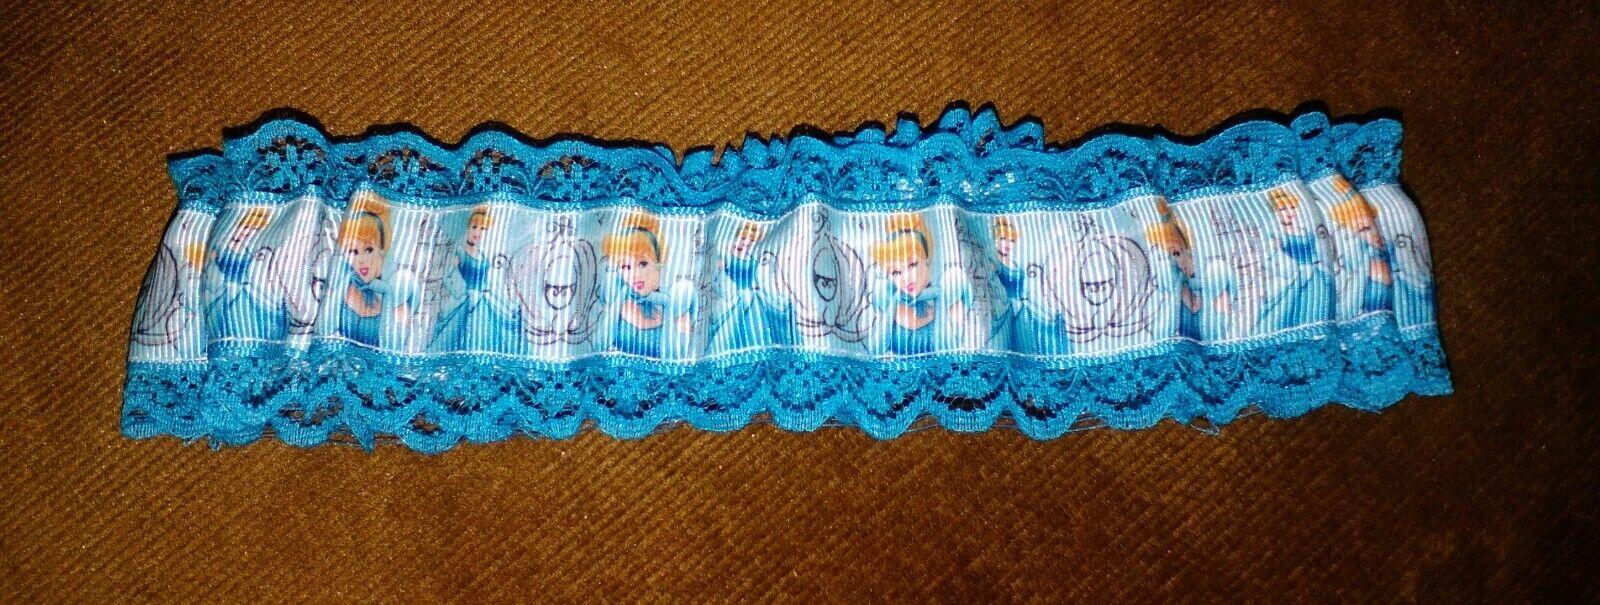 Cinderella on lagoon blue lace wedding garter burlesque garter new defect